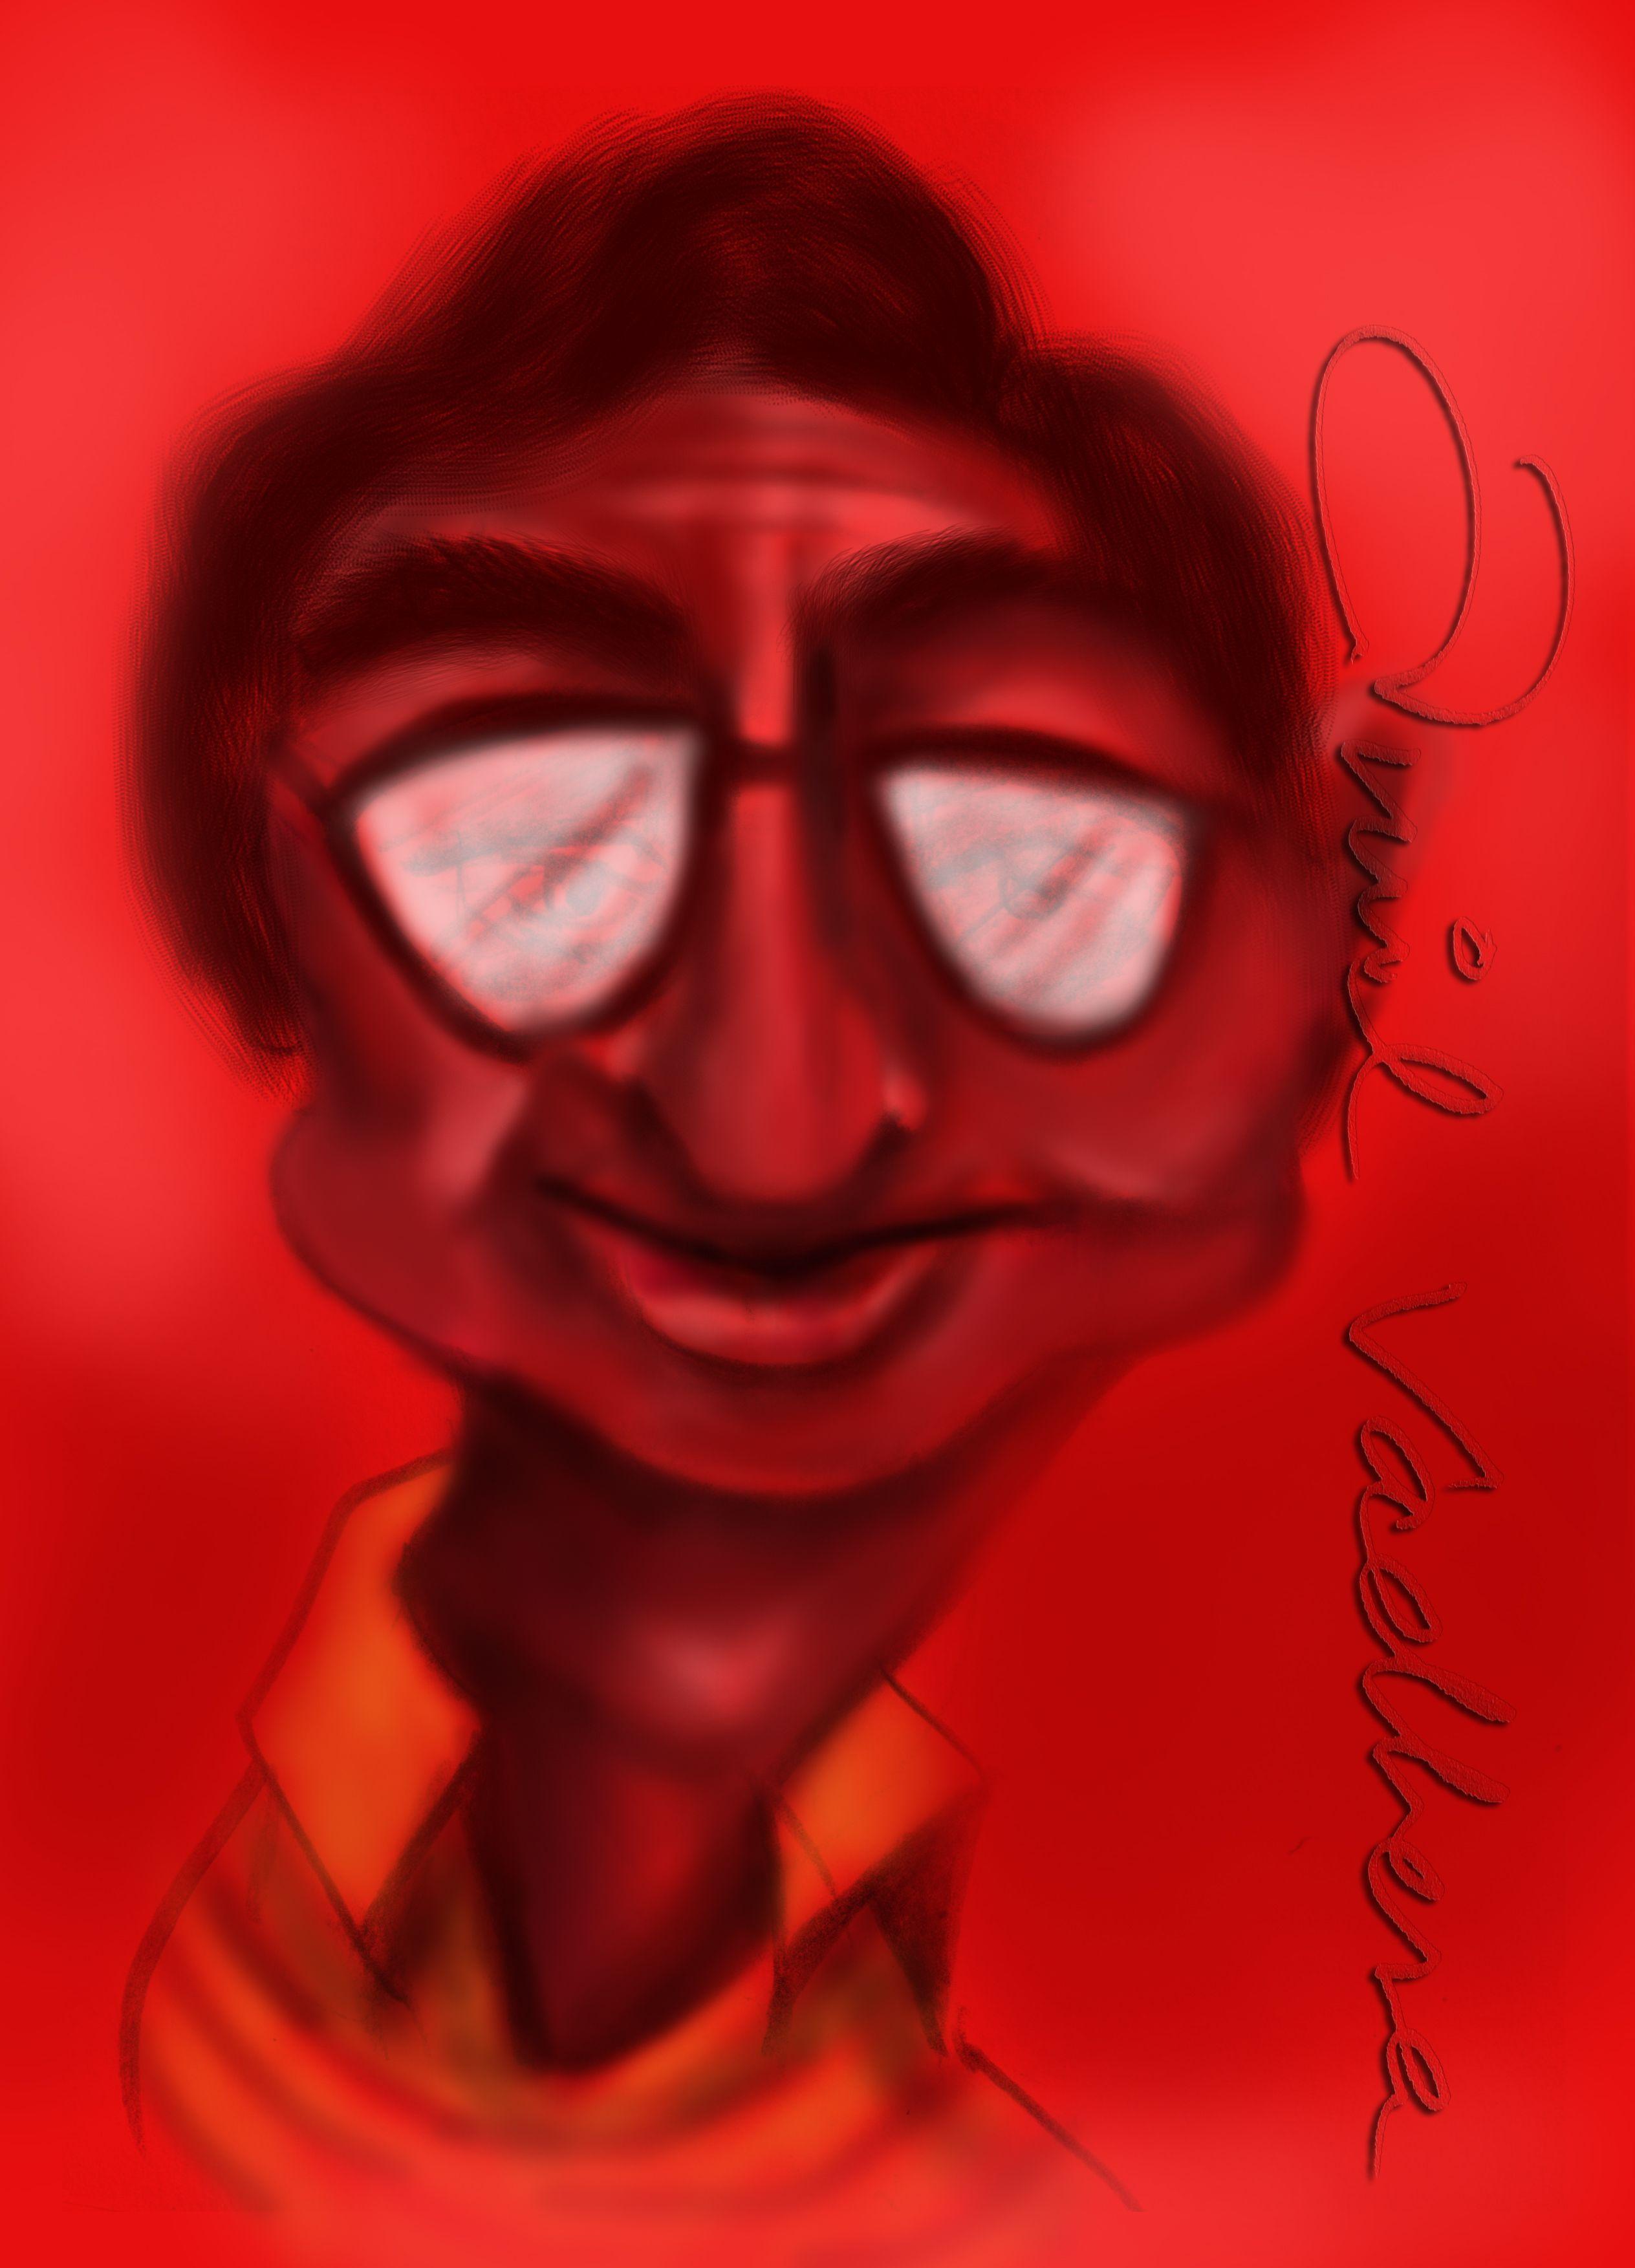 Digital cartoon character design by Anil Vadhera